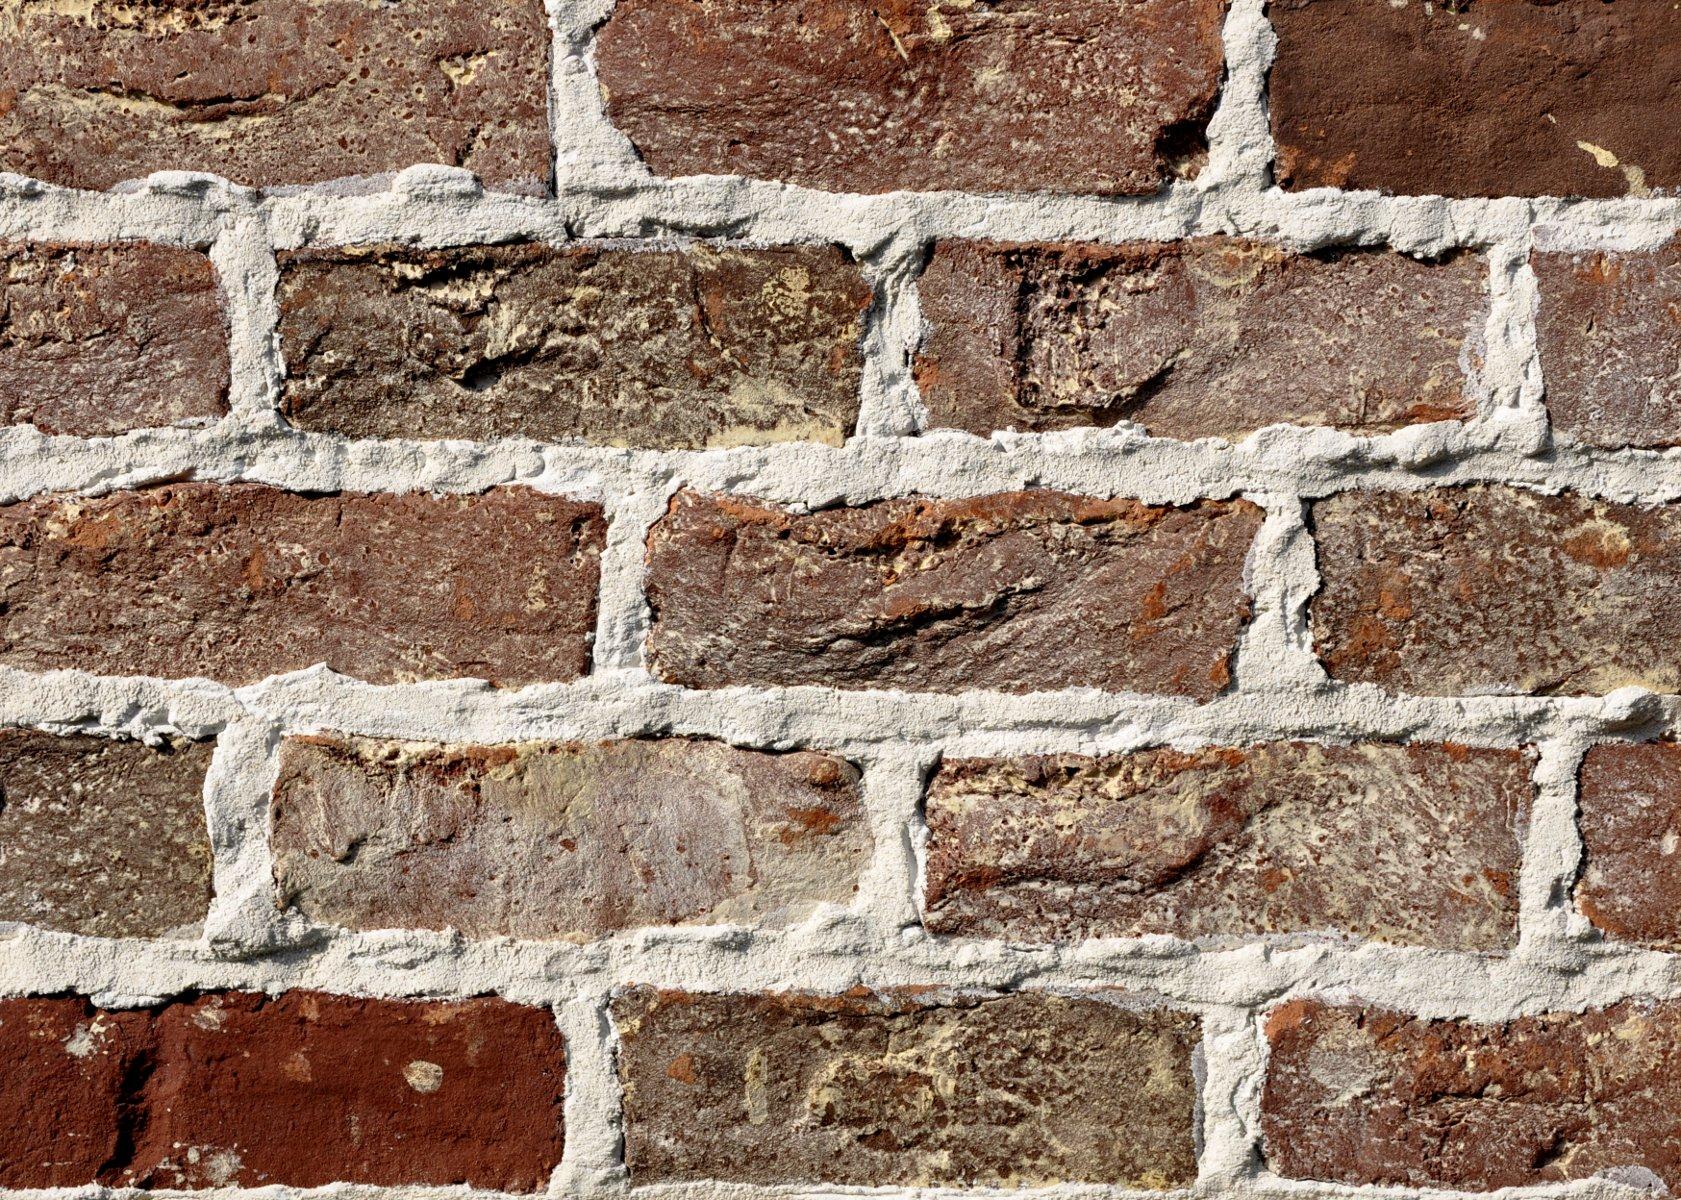 Brick Wall, Abstract, Rock, Line, Masonry, HQ Photo